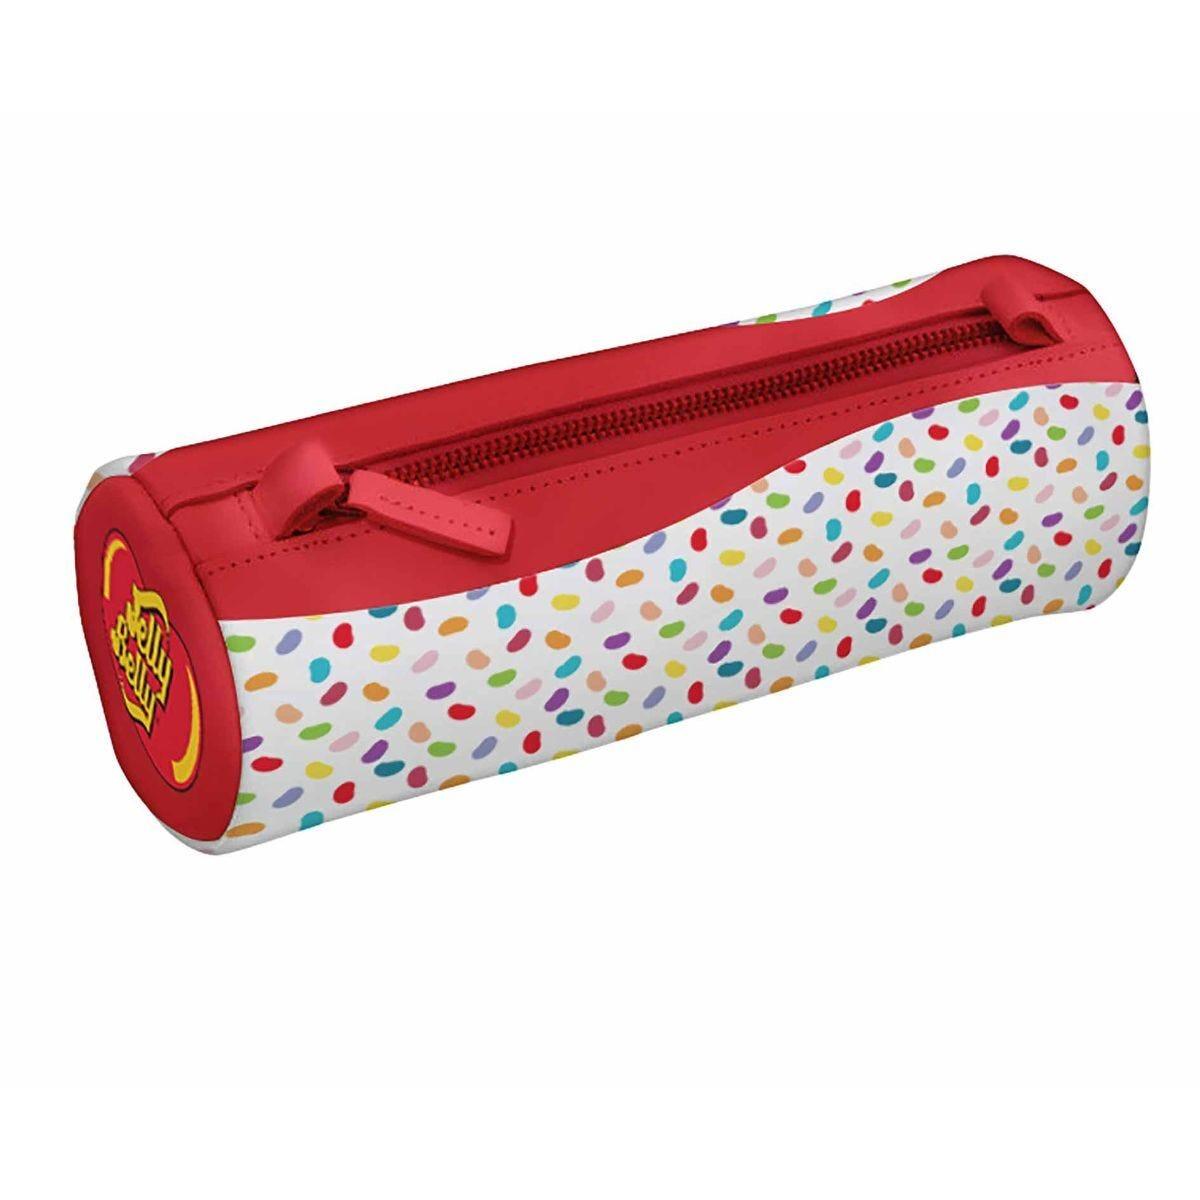 Jelly Belly Barrel Pencil Case